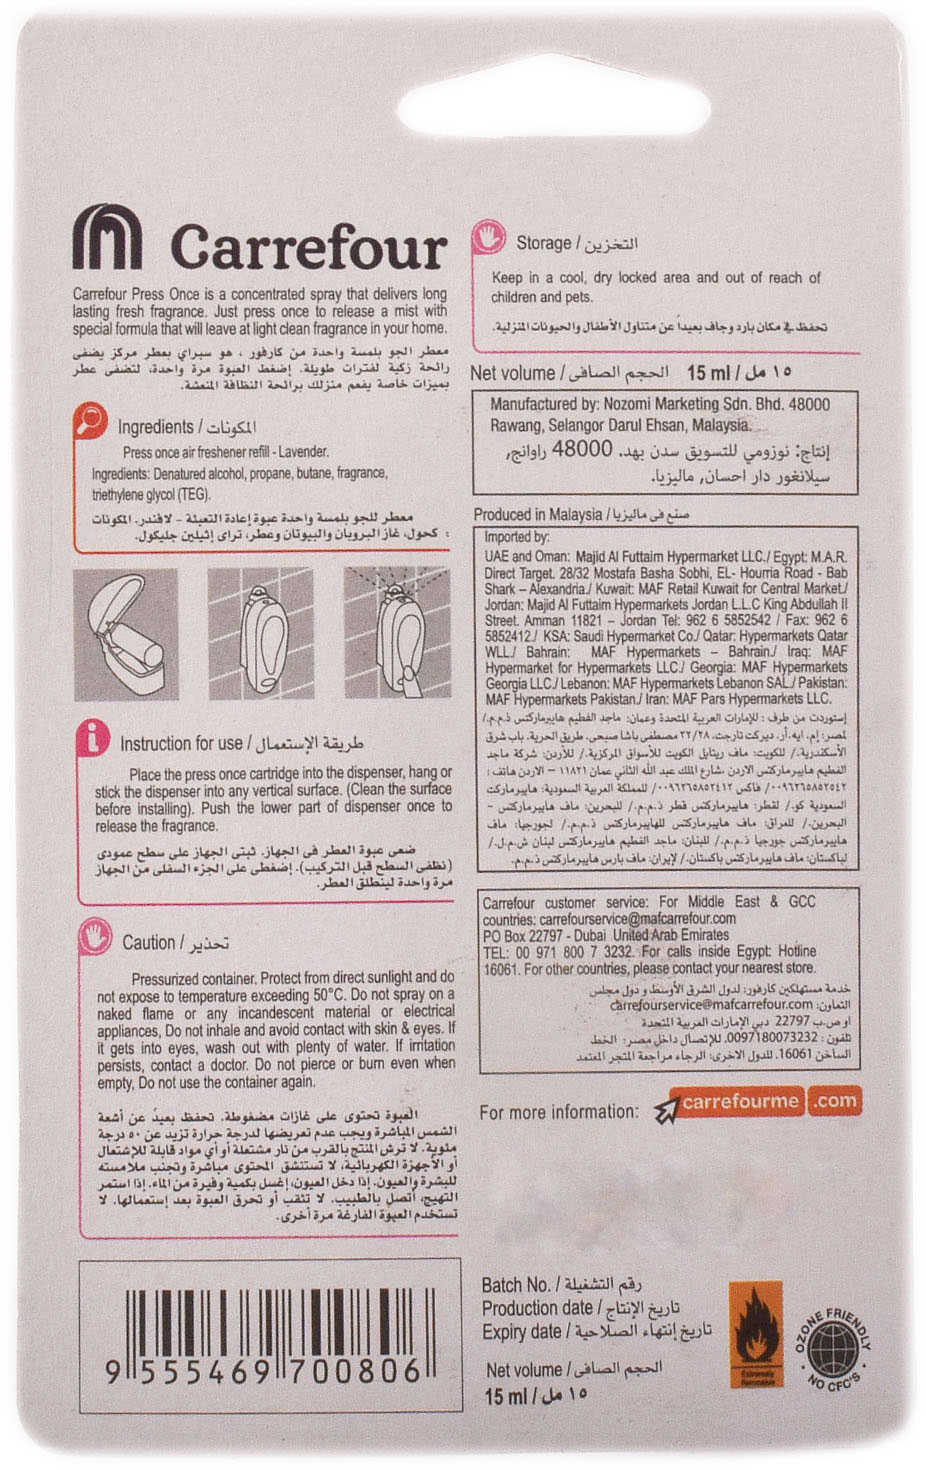 CRF AIR FRESHNER LAVENDR REFIL 15ML